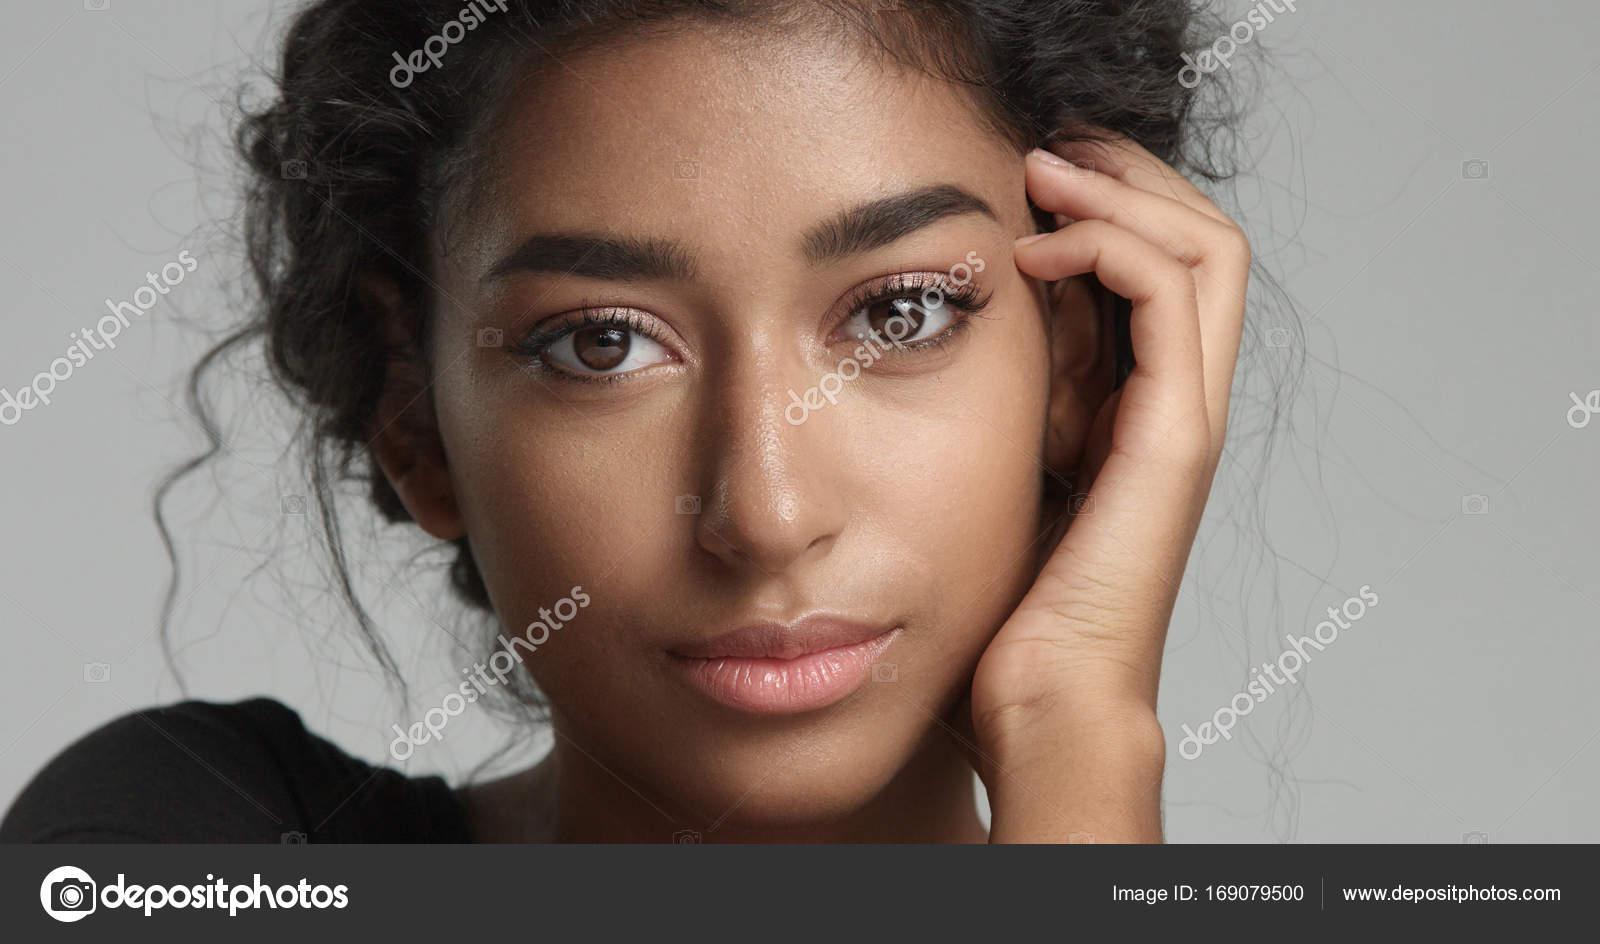 Fotos Modelos Caras Bonitas Atractivo Joven Modelo Oriente